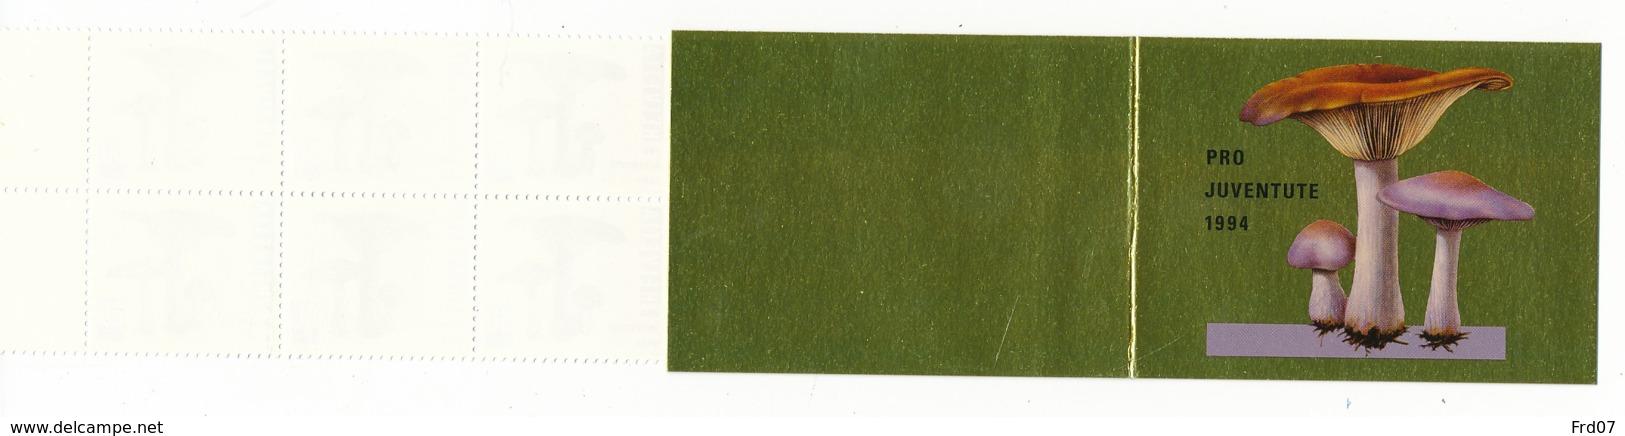 Suisse Carnet C1465 – Pro Juventute 1994 – CHF 10.00 = €9.20 – Champignons - Booklets